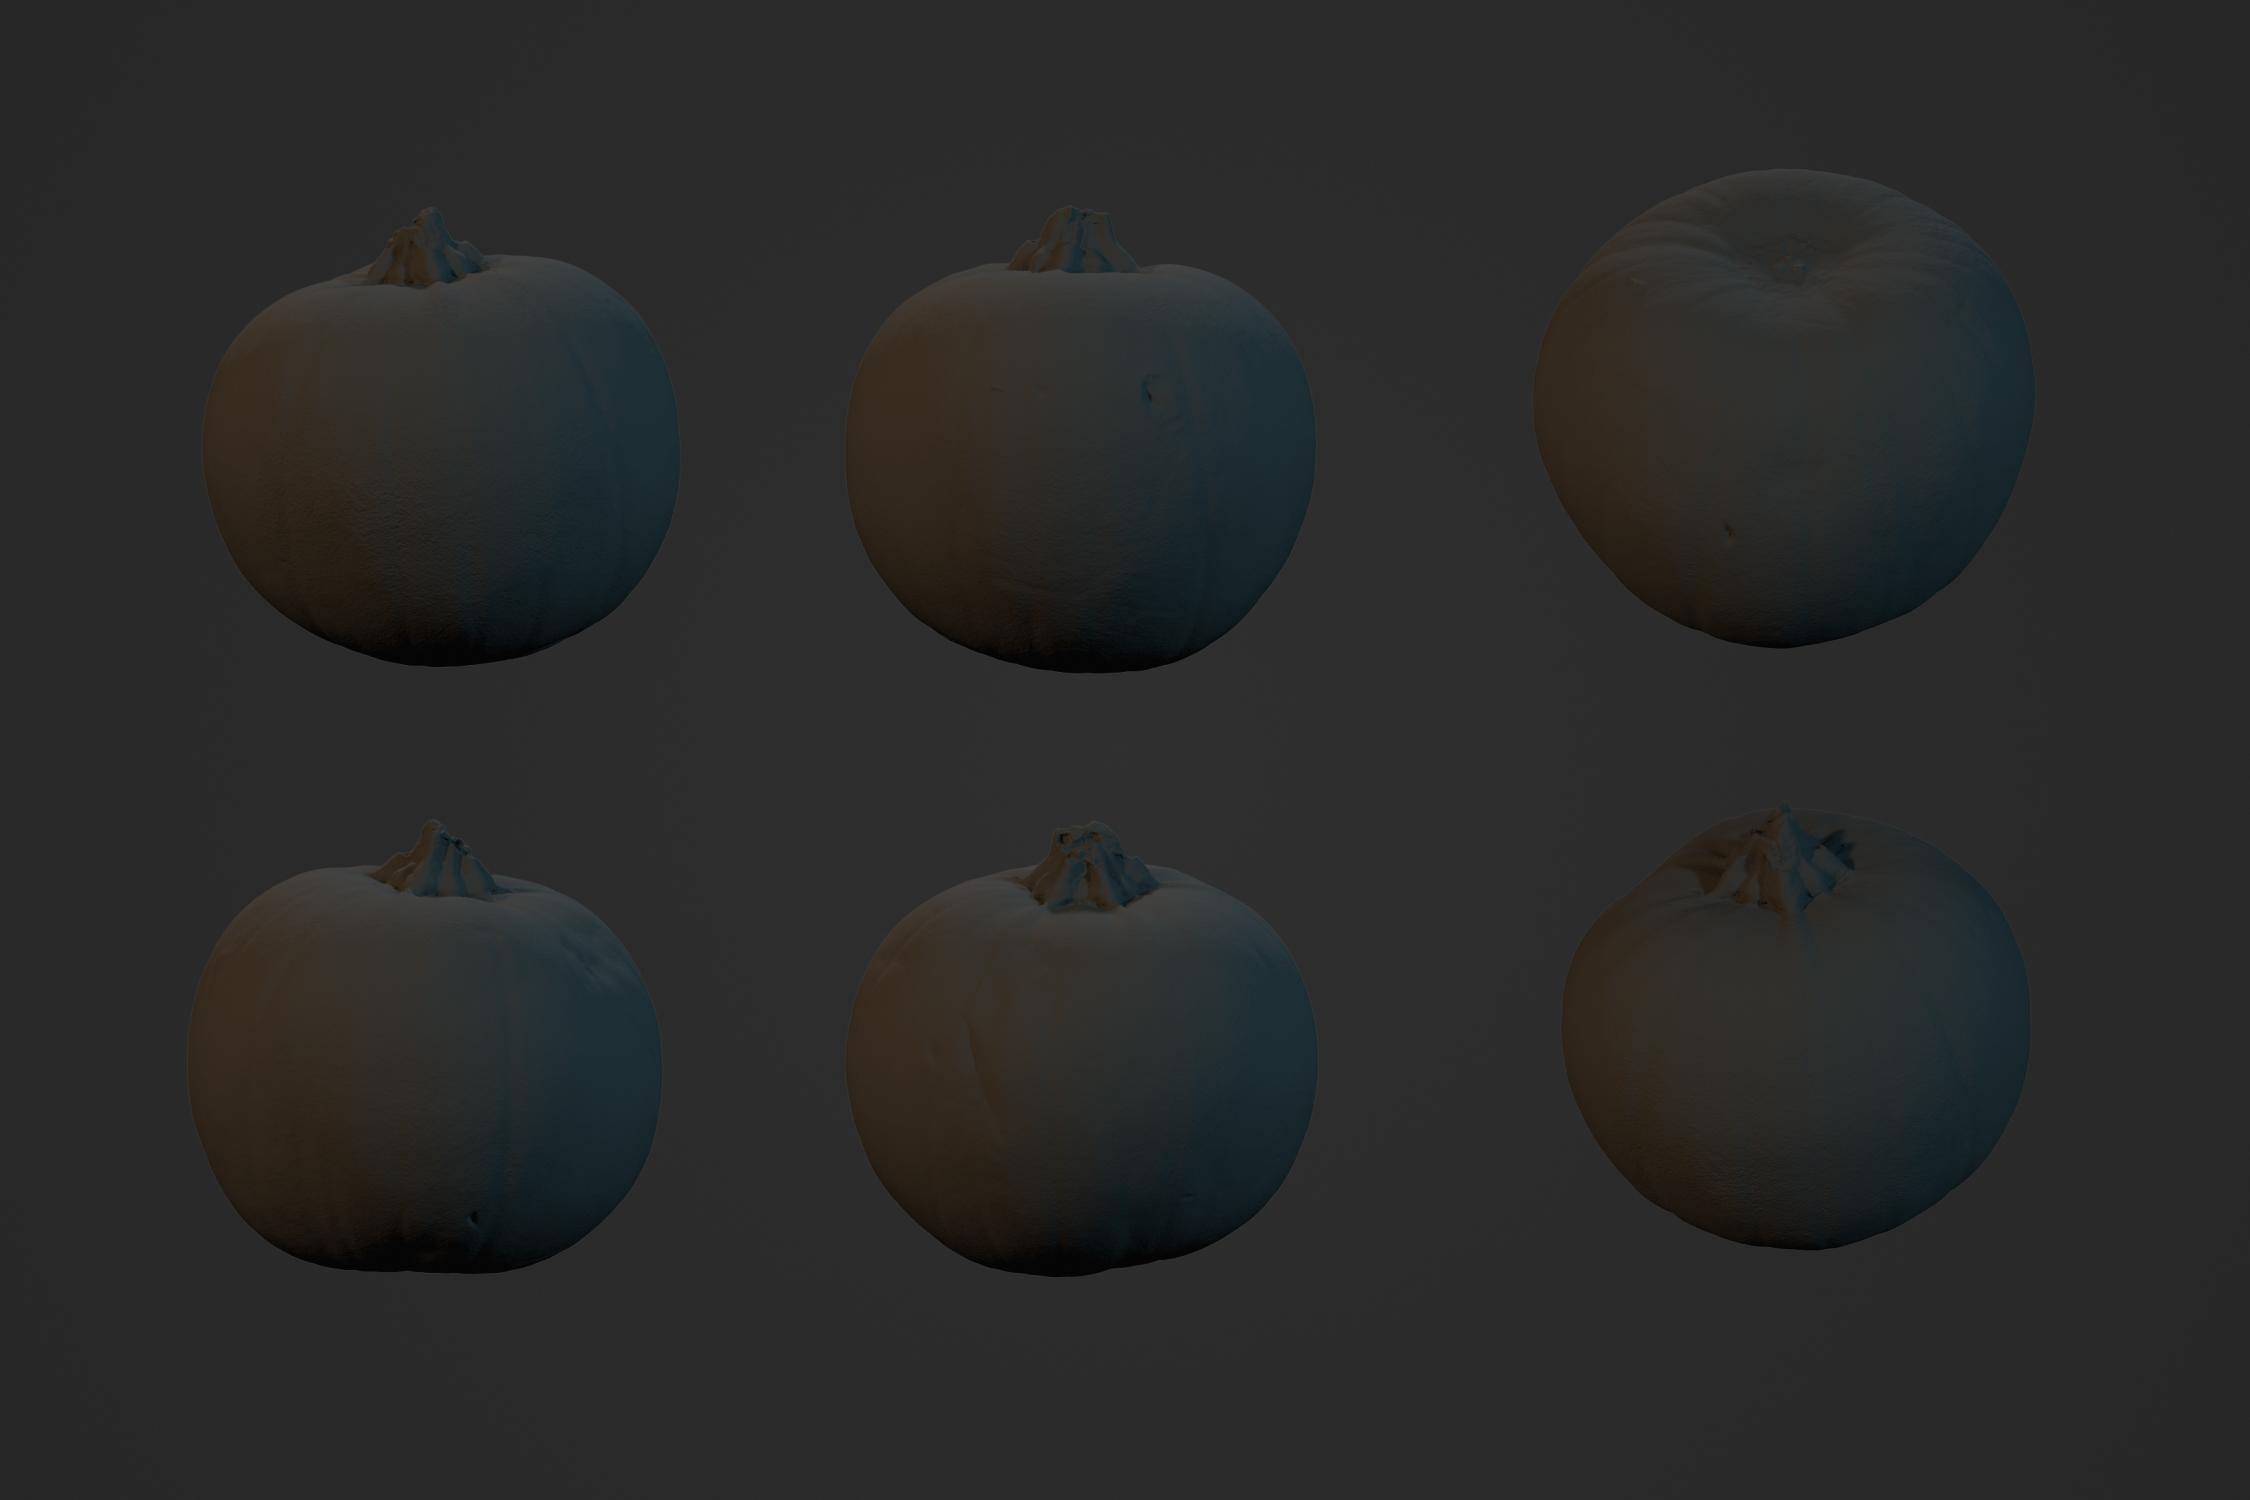 Small_Pumpkin_1_0.jpg